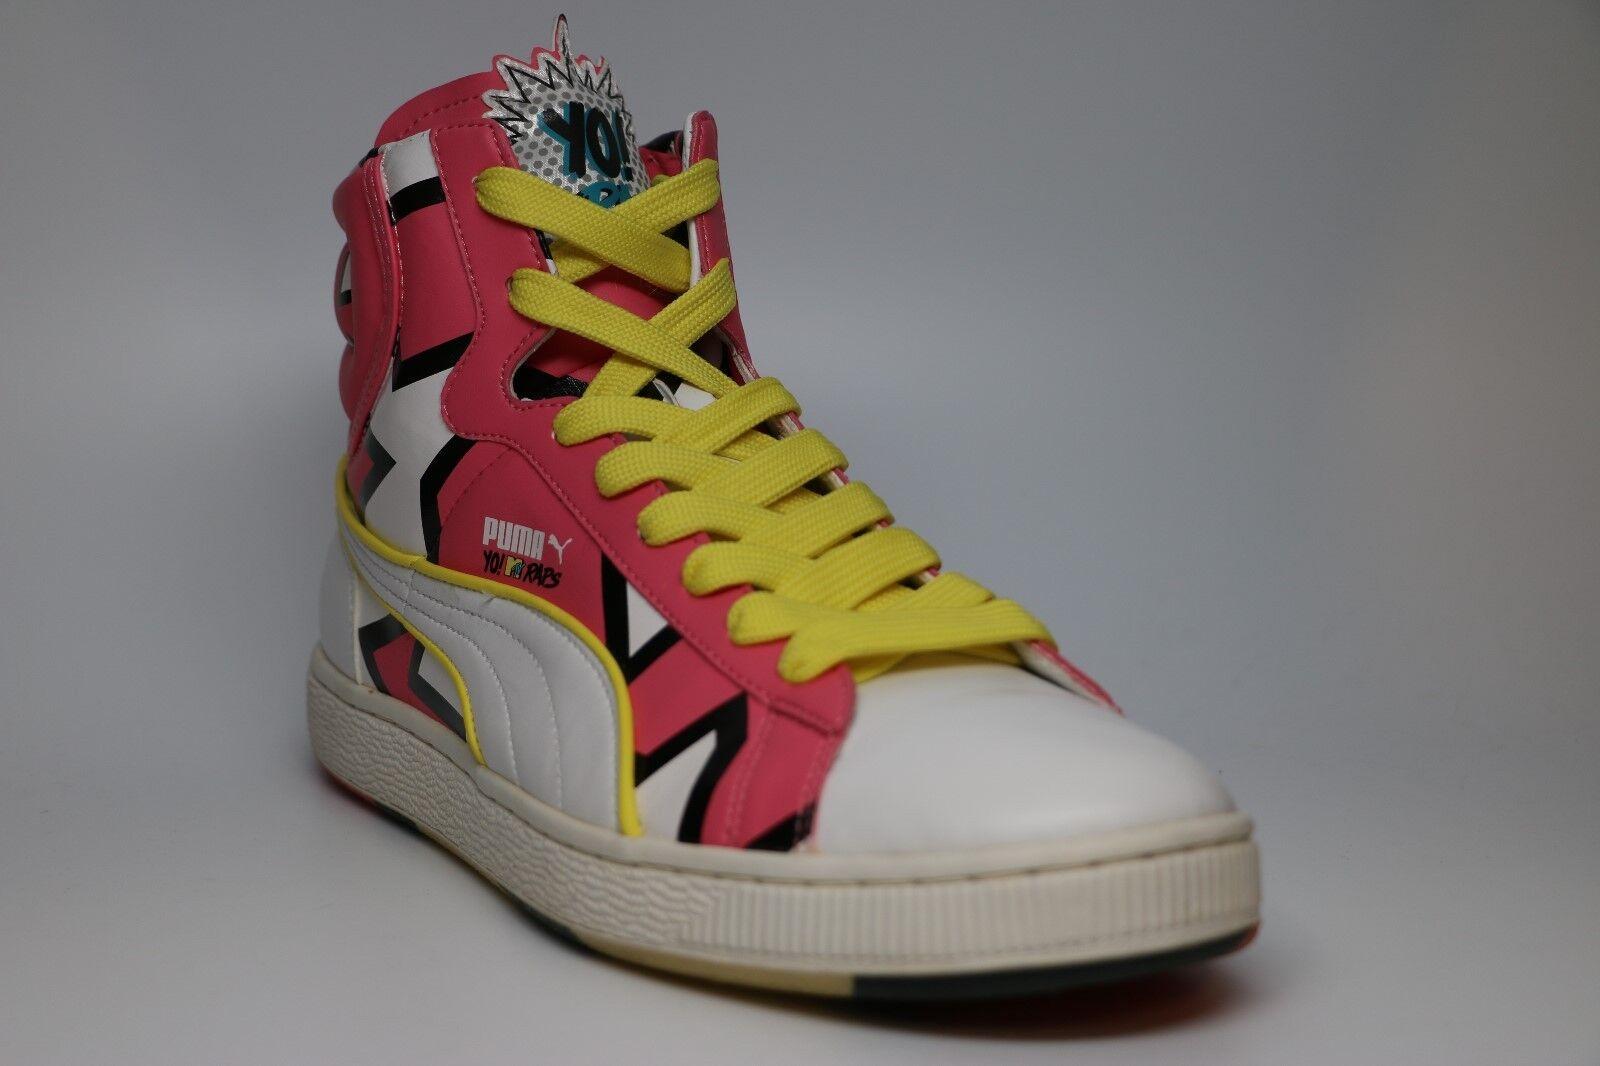 NIB Puma Yo MTV Raps First Round | Size 10 | Style 347735-02